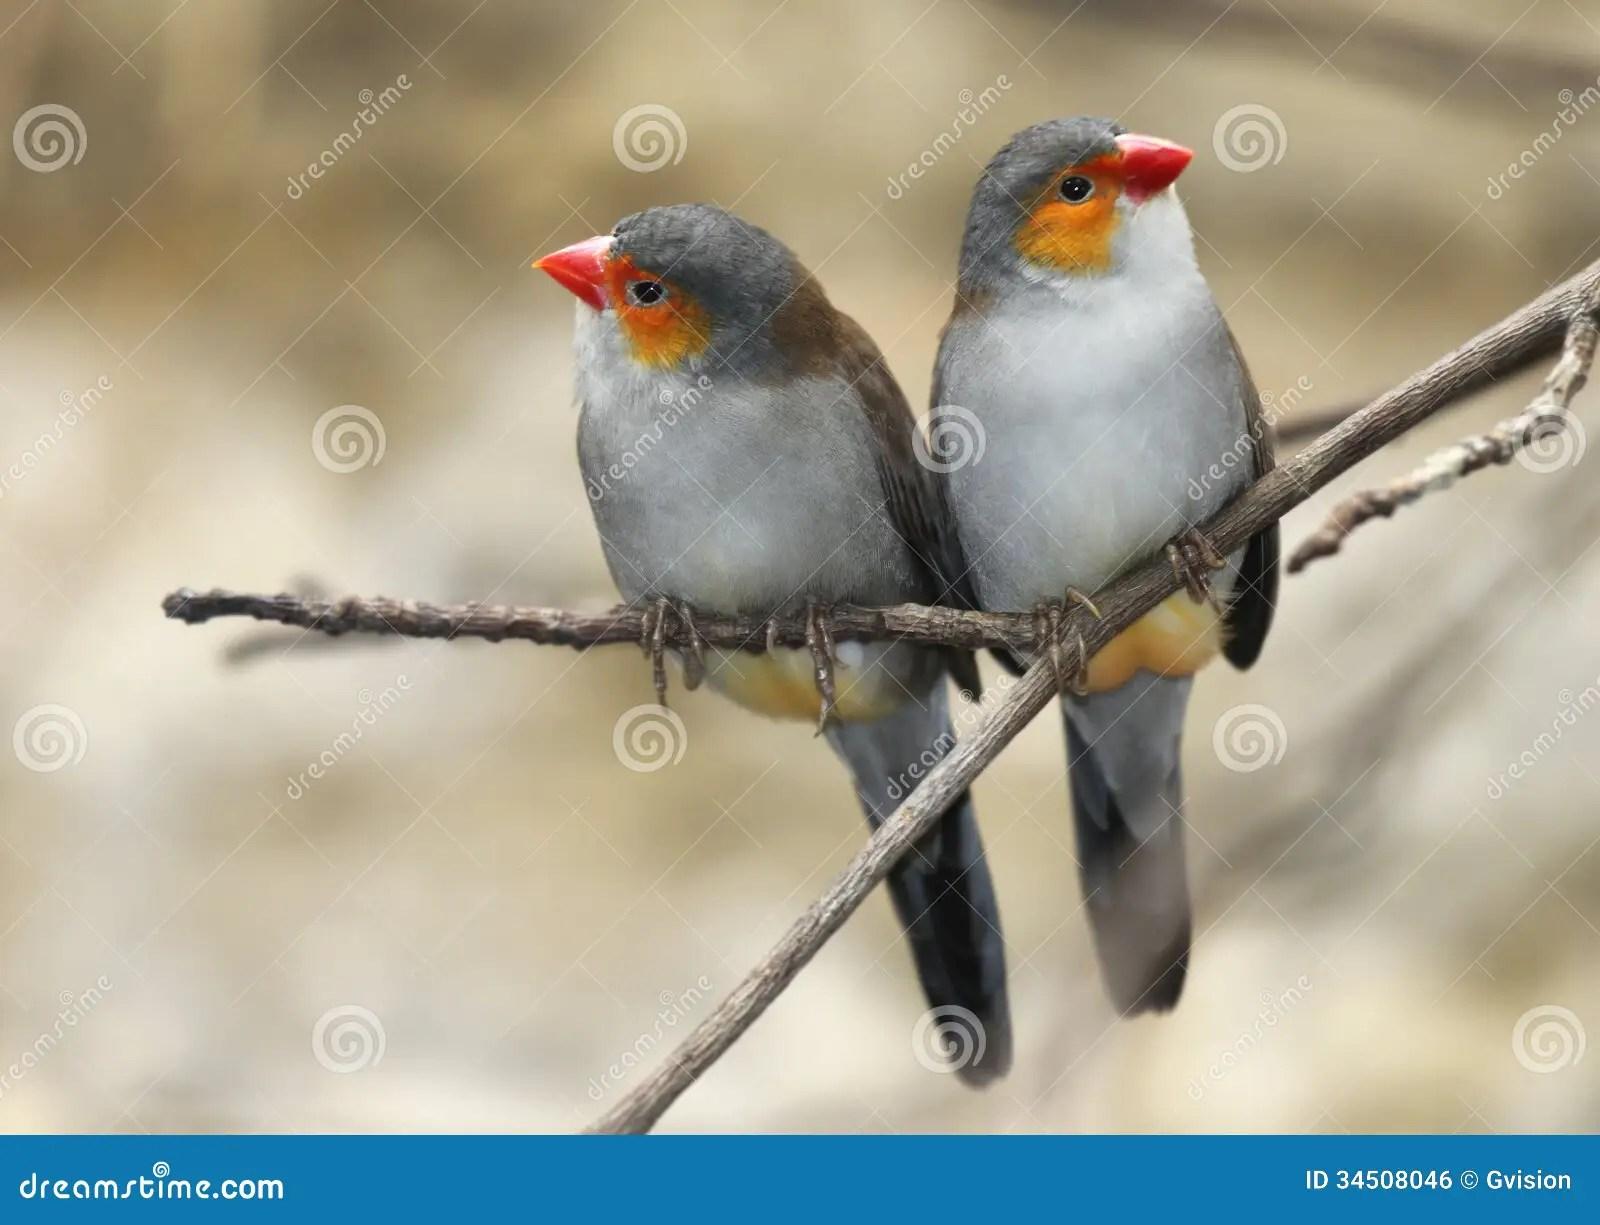 Wallpaper 3d Free Download Pc 两只鸟